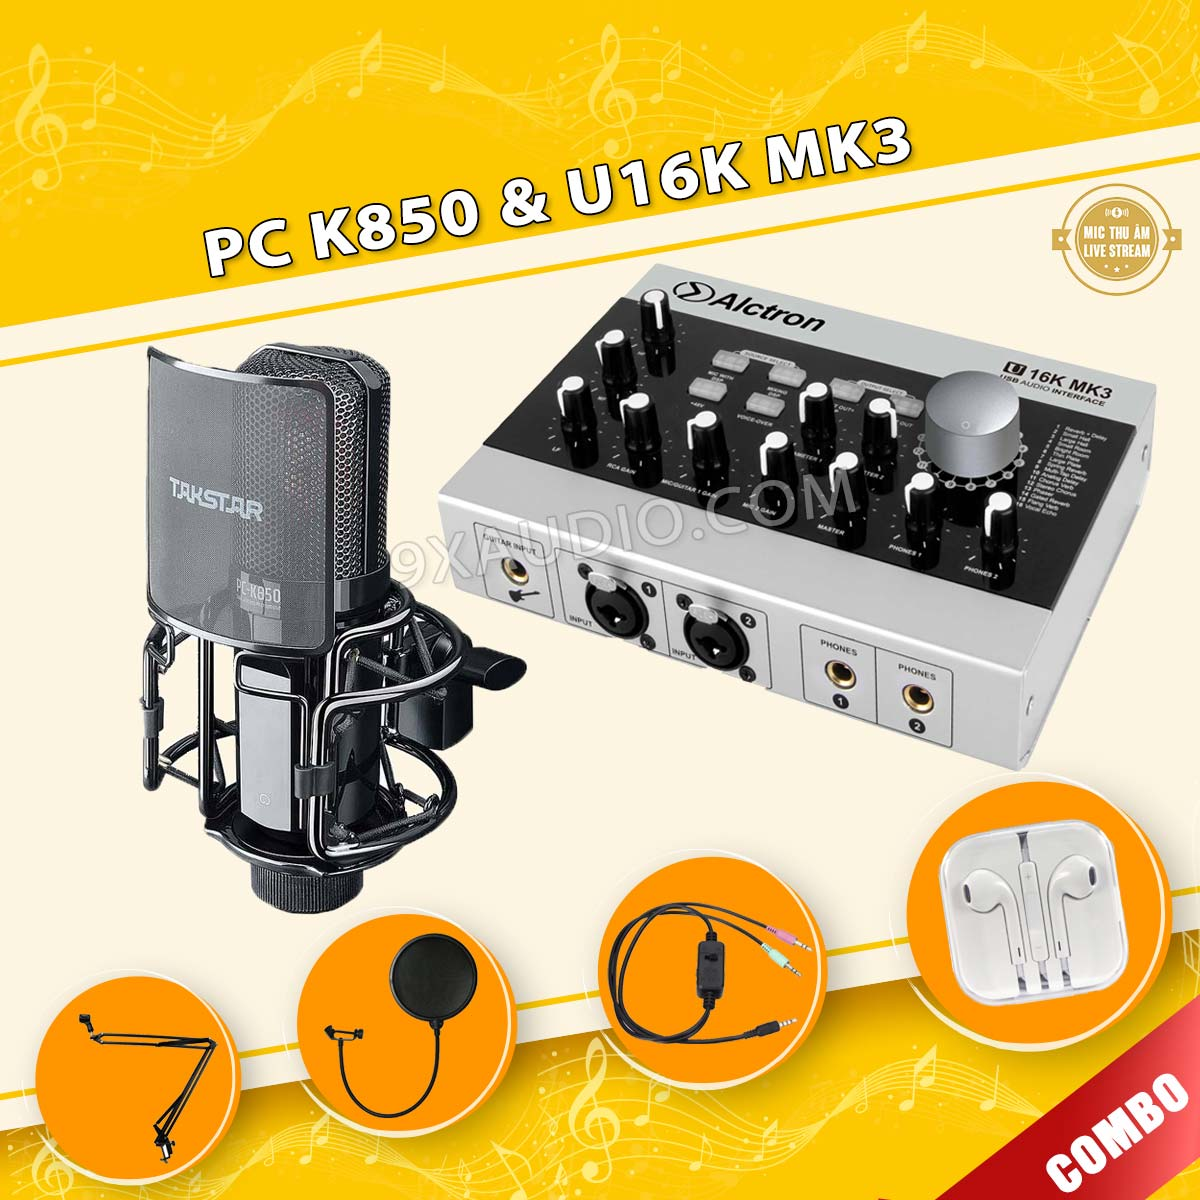 mic thu âm pc k850 u16k mk3 full